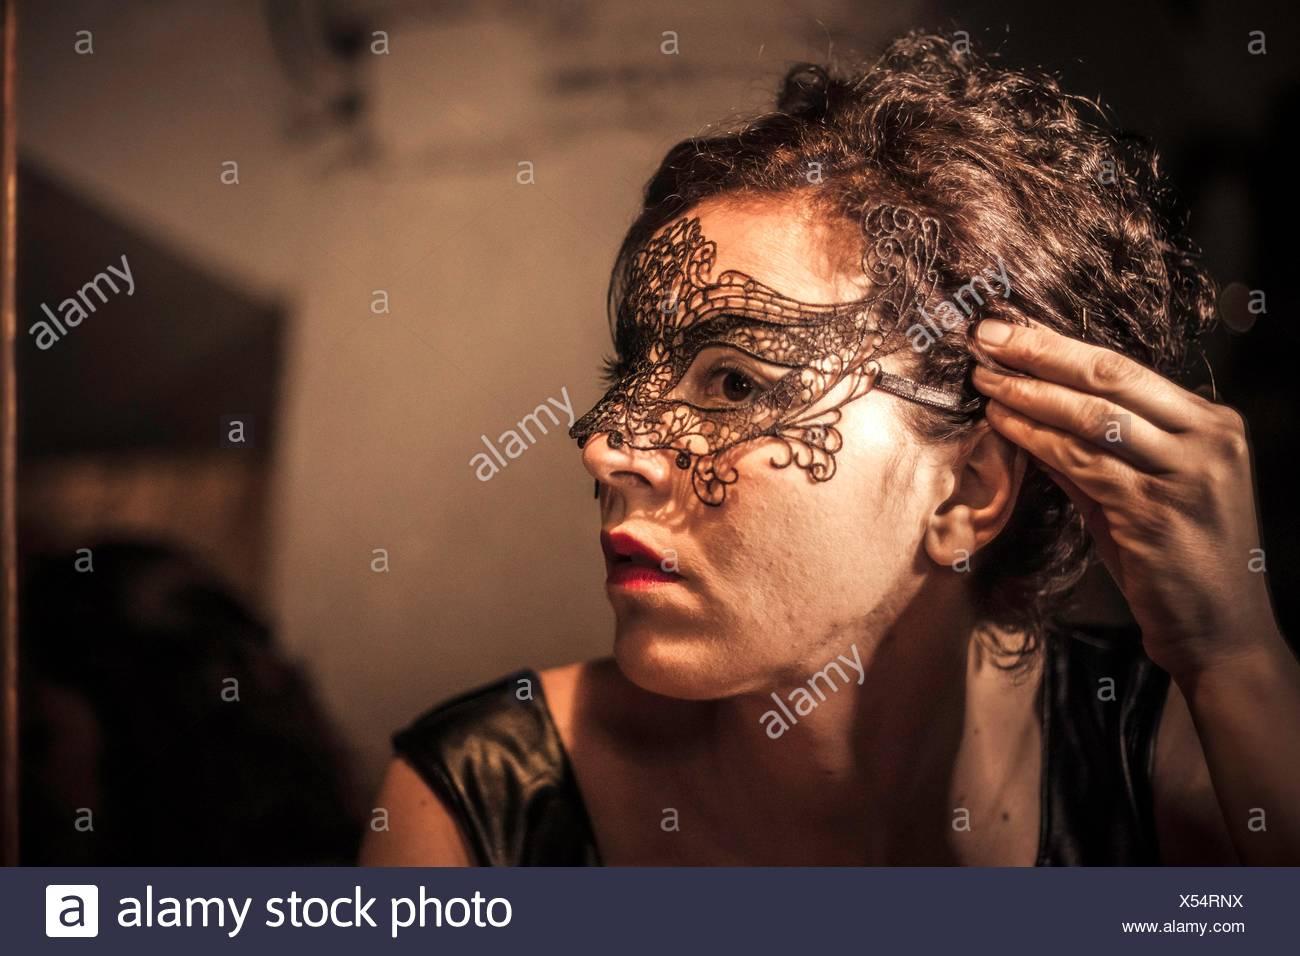 Imagen de joven mujer preparando para disparar Imagen De Stock